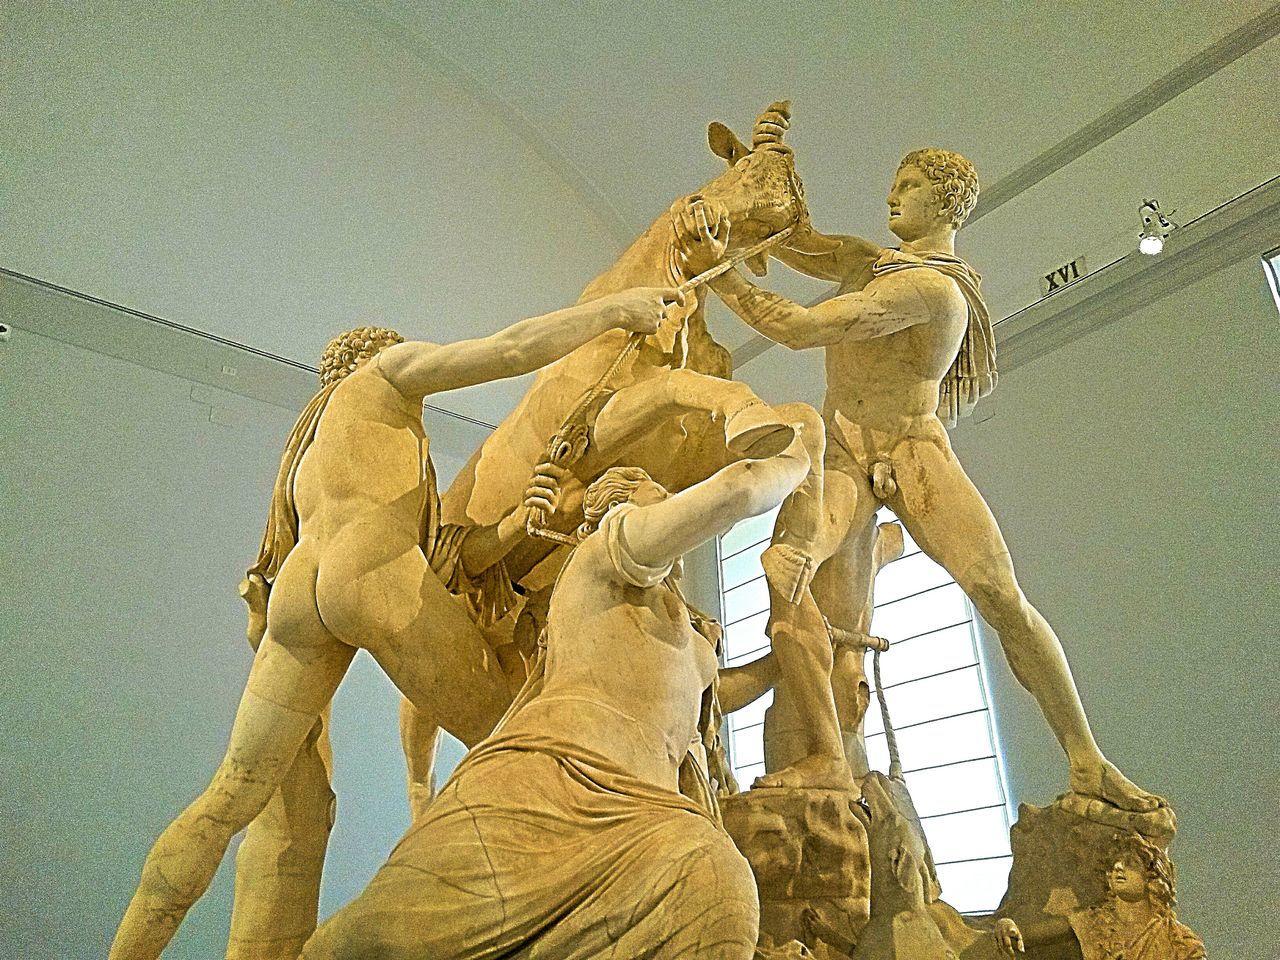 Tauromaquia Taurus Sculpture Statue No People Roman Art Adriano Museum